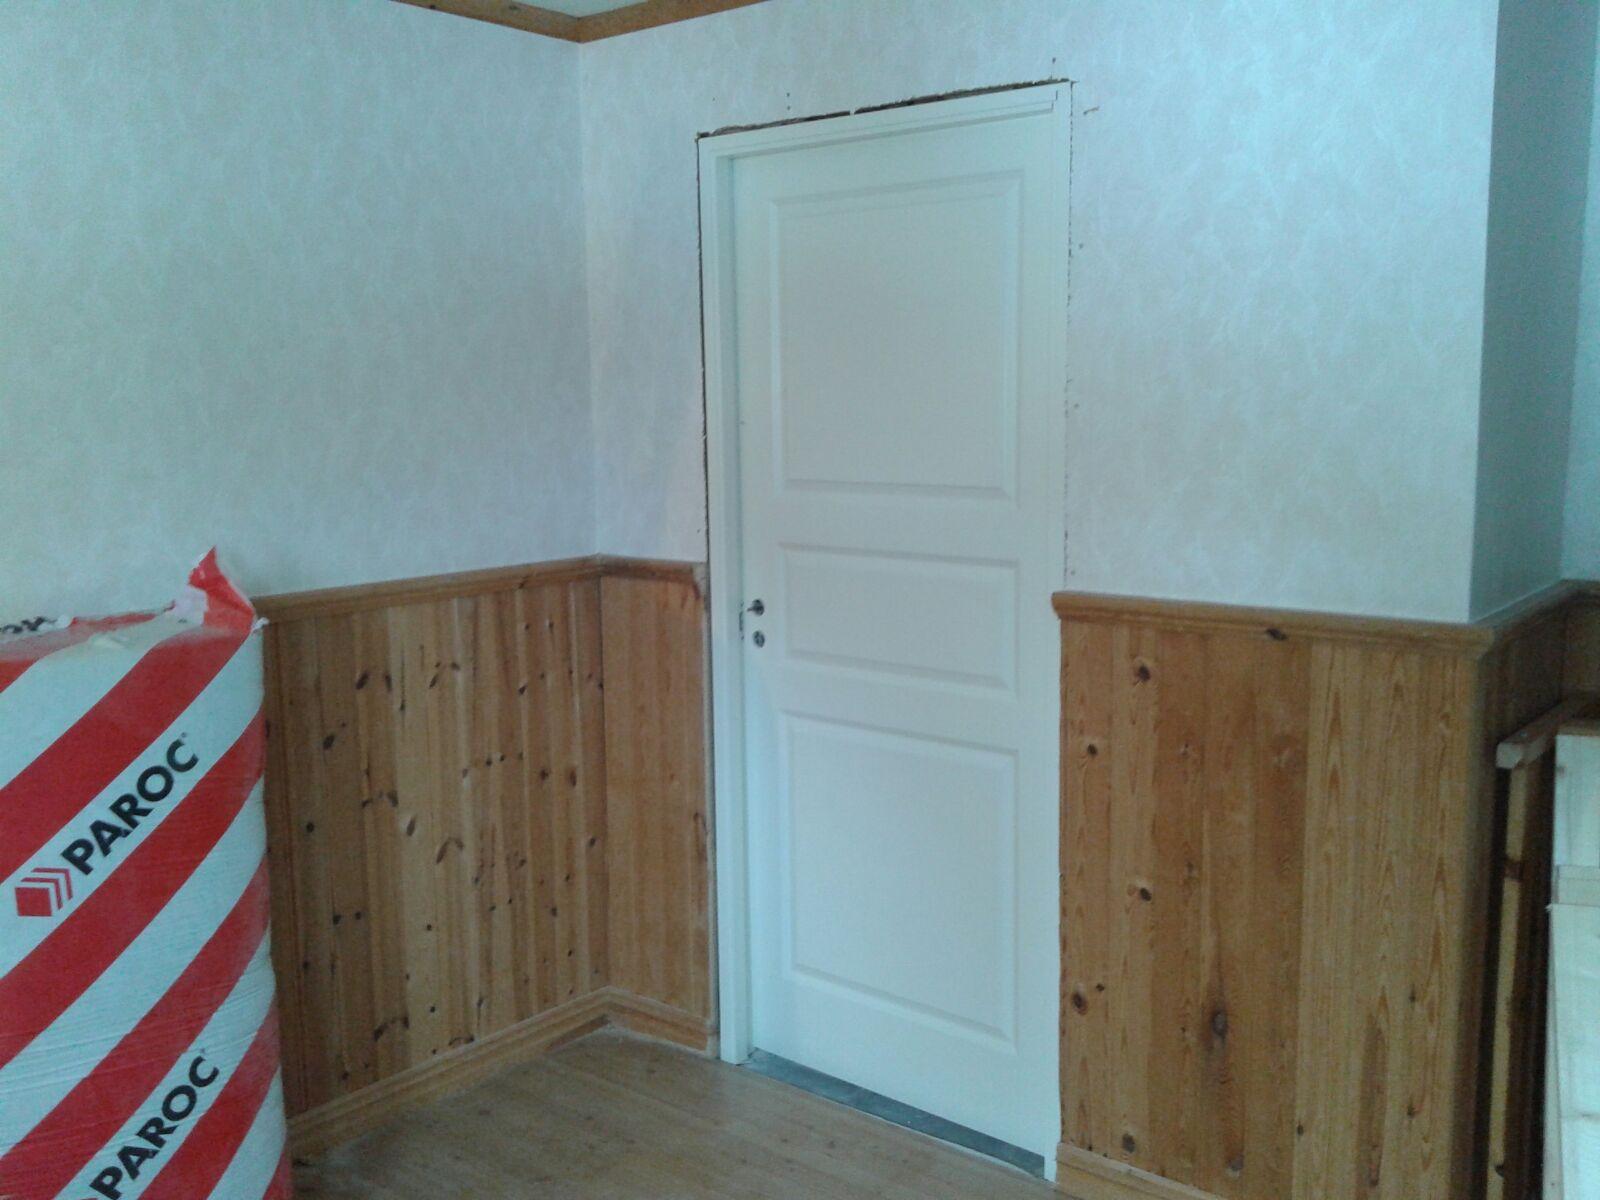 Enkeltje Zweden: Appartement nummer 2